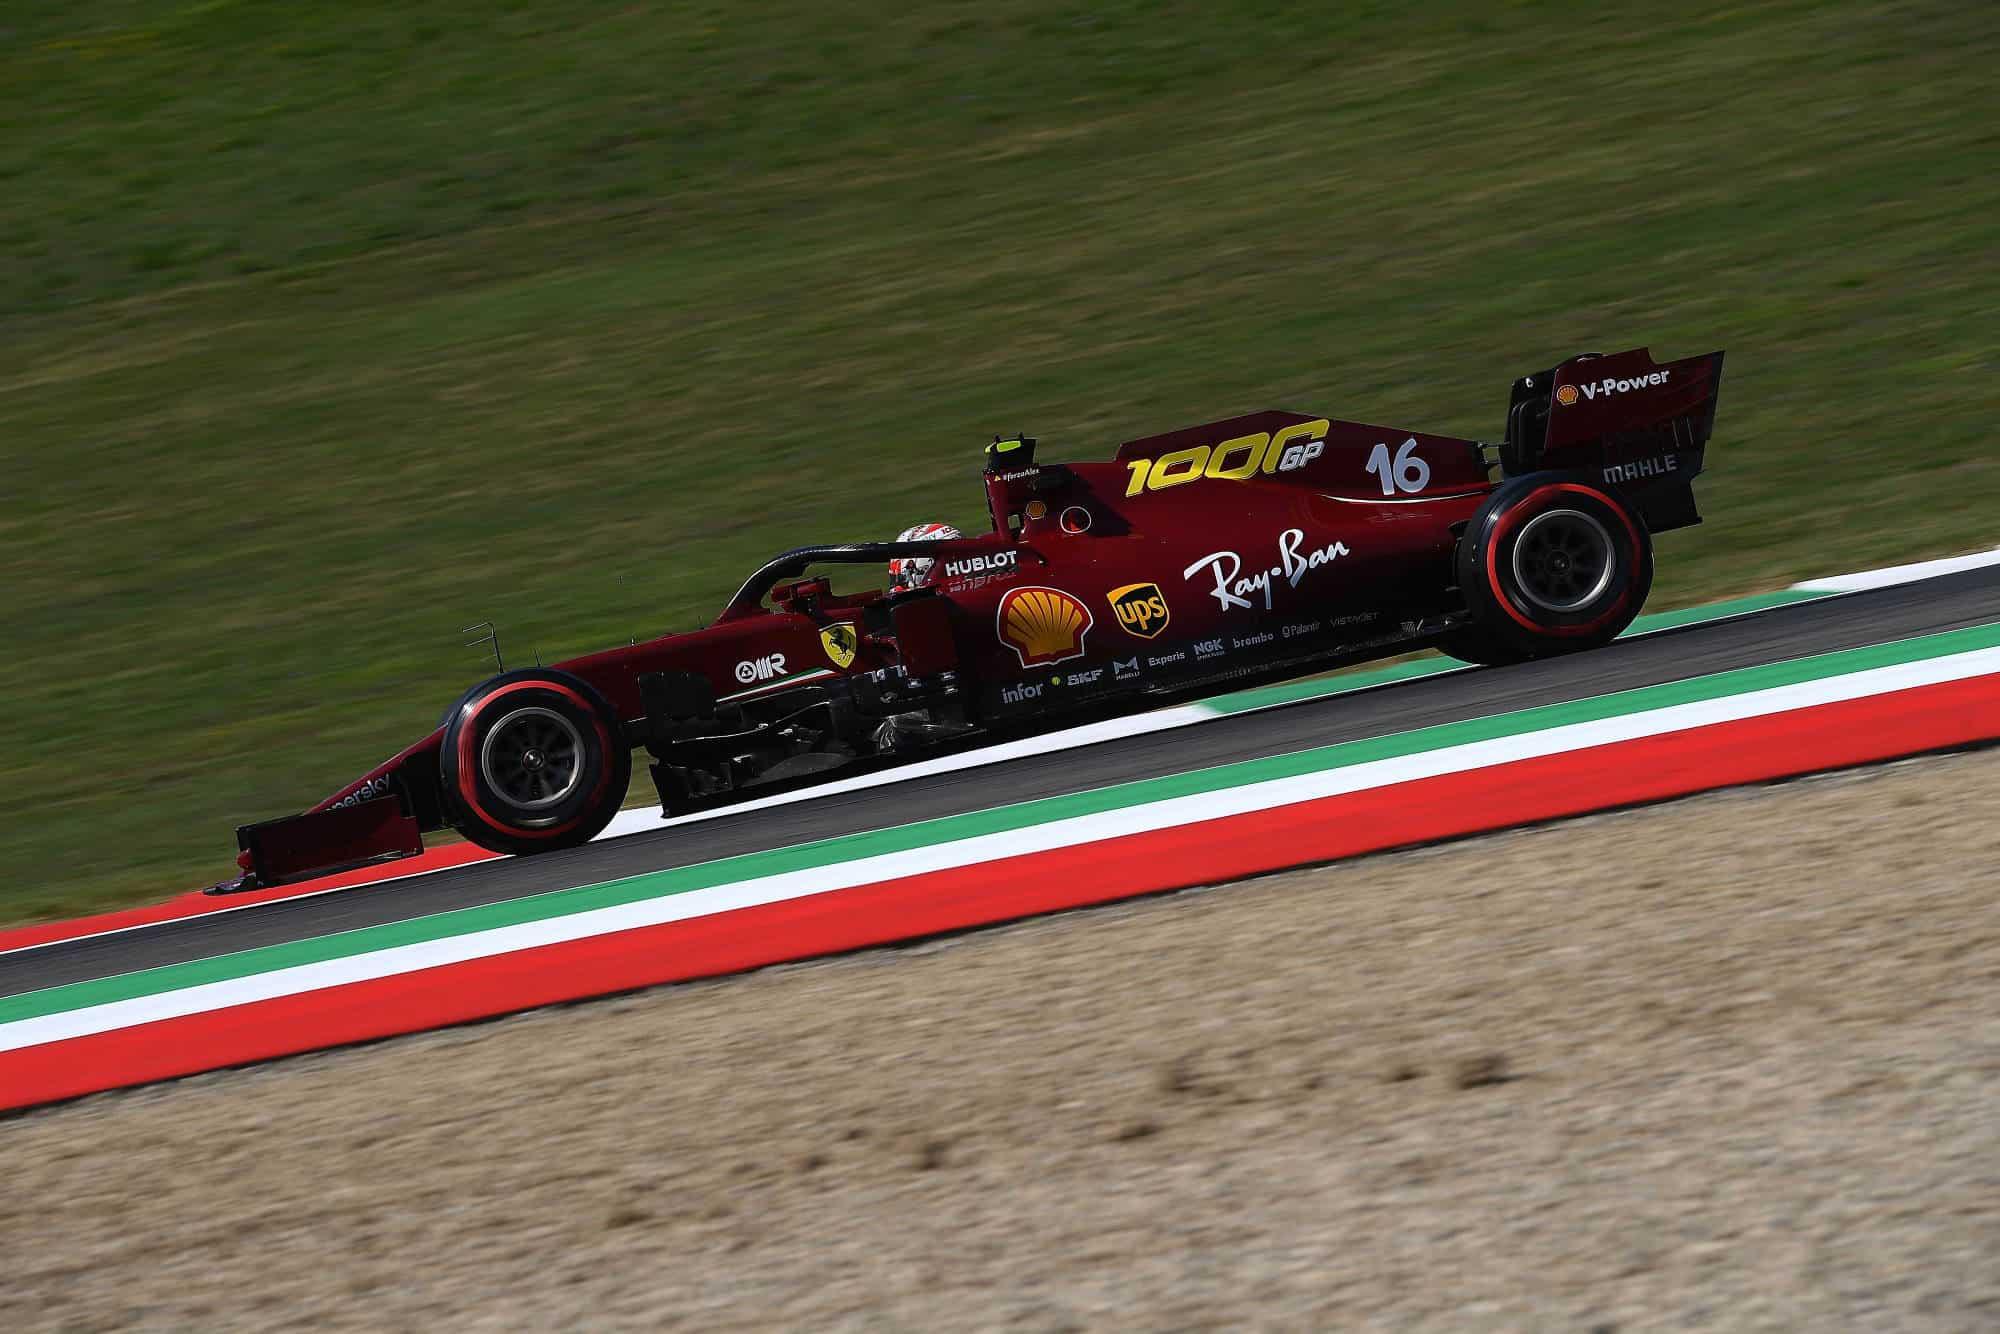 2020 Tuscan GP Ferrari SF1000 special livery Leclerc Saturday Photo Ferrari